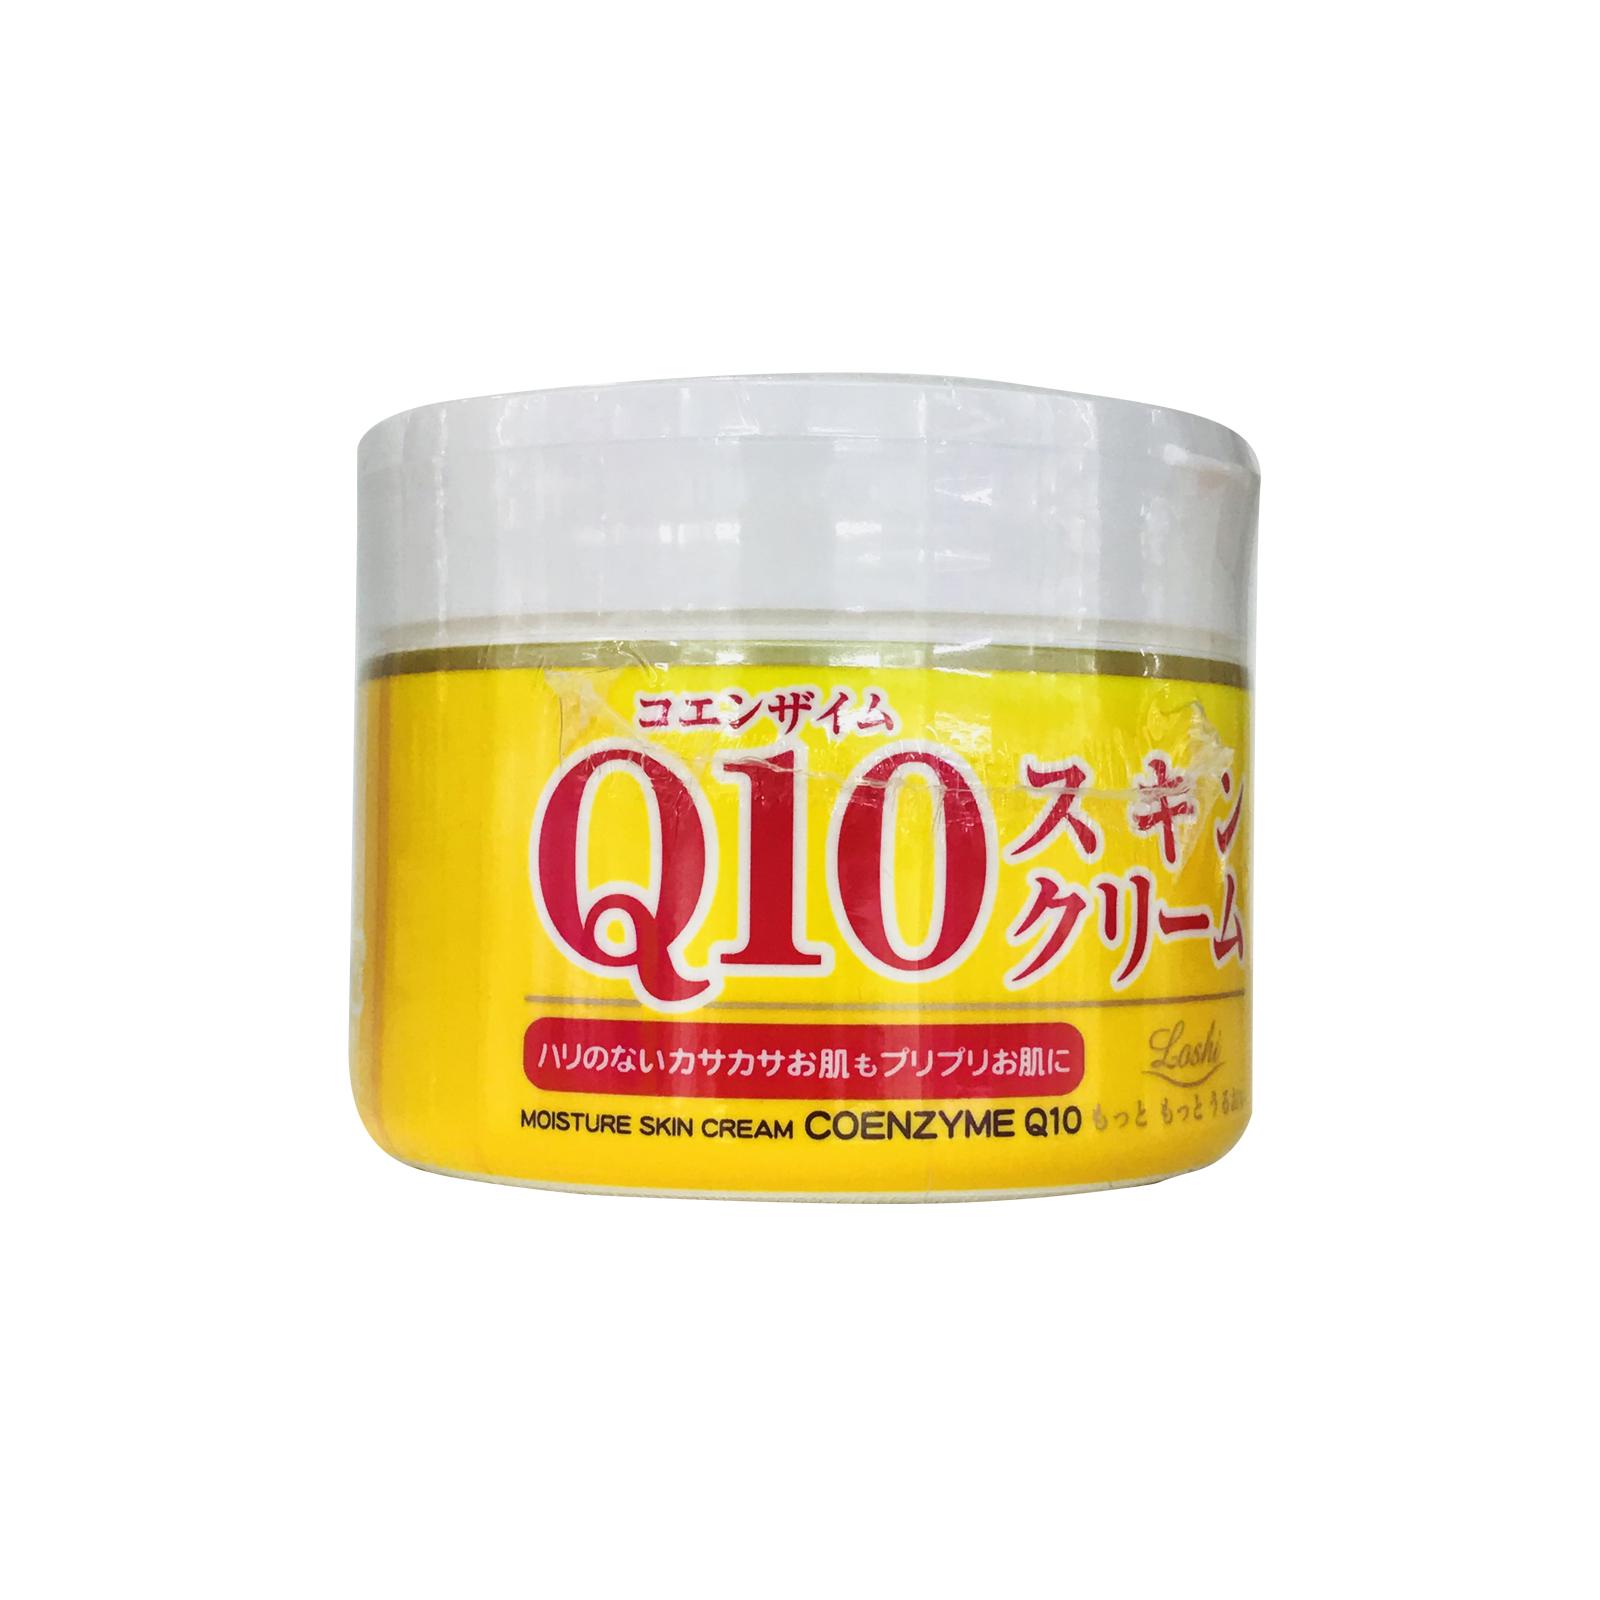 Loshi Q10再生素活肤霜 220g